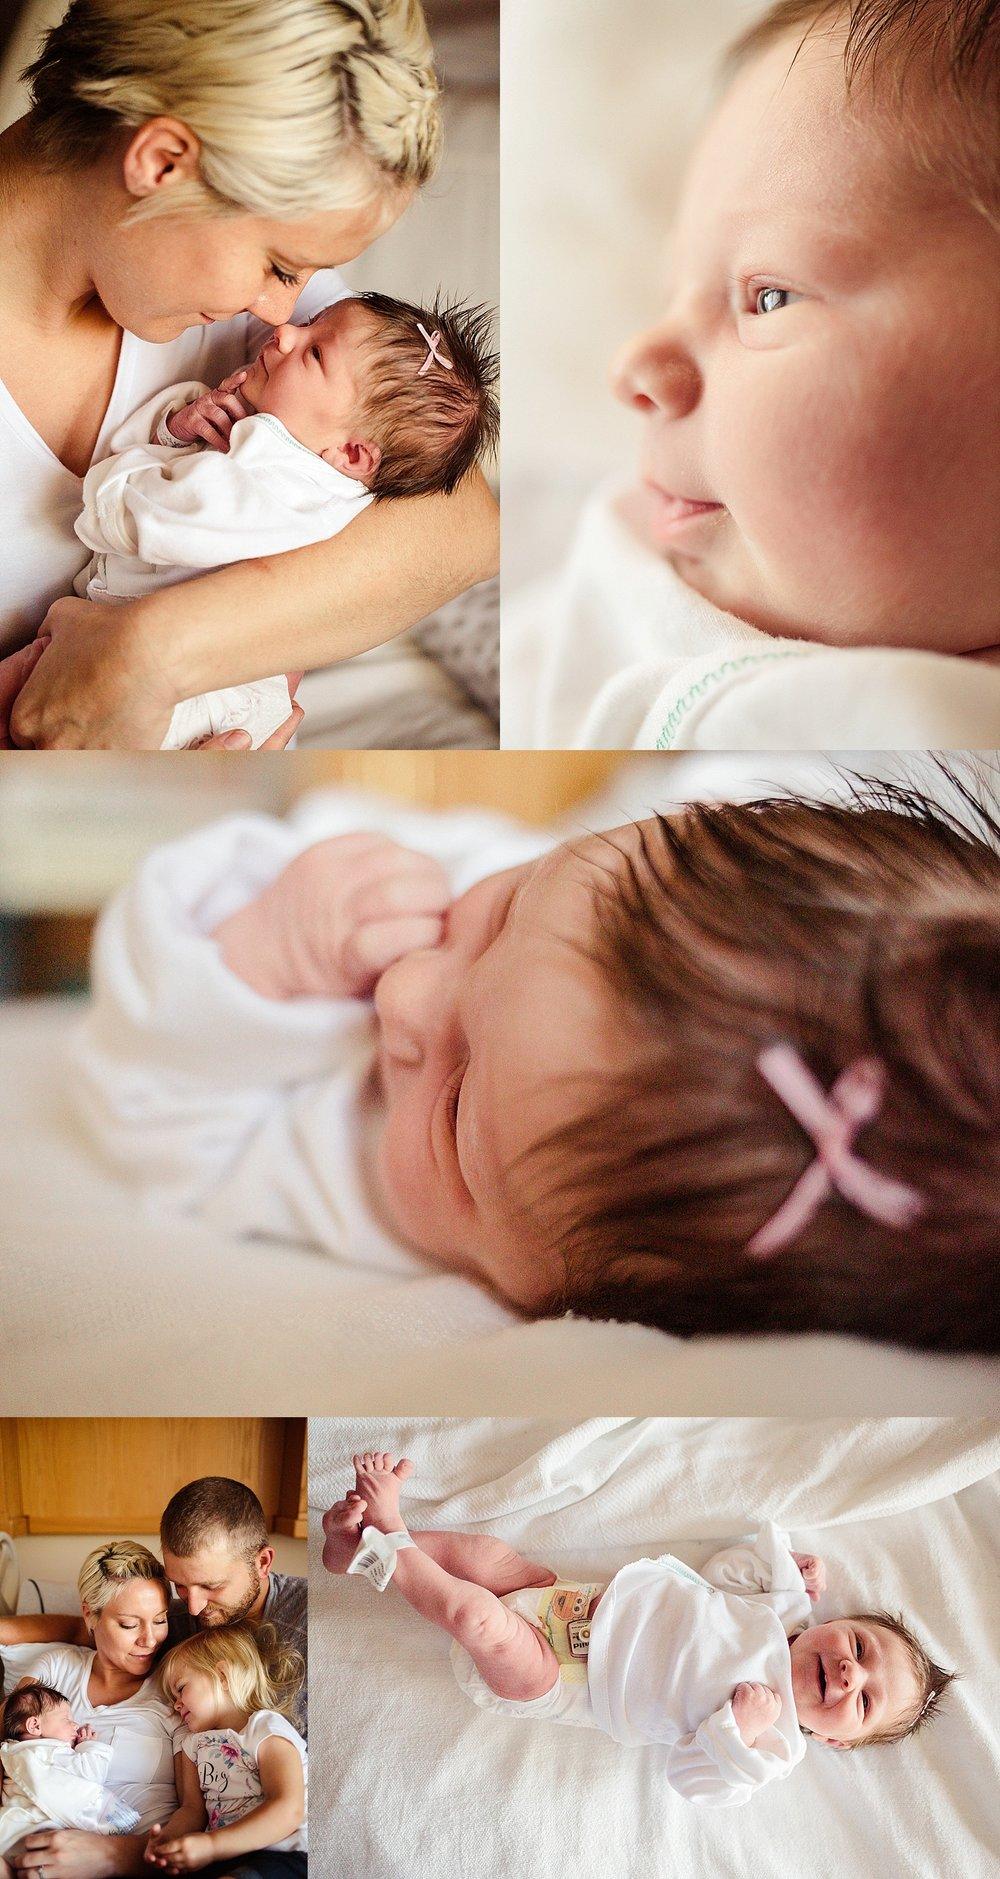 Akron Ohio Photography, In hospital newborn photography session, Millersburg Ohio